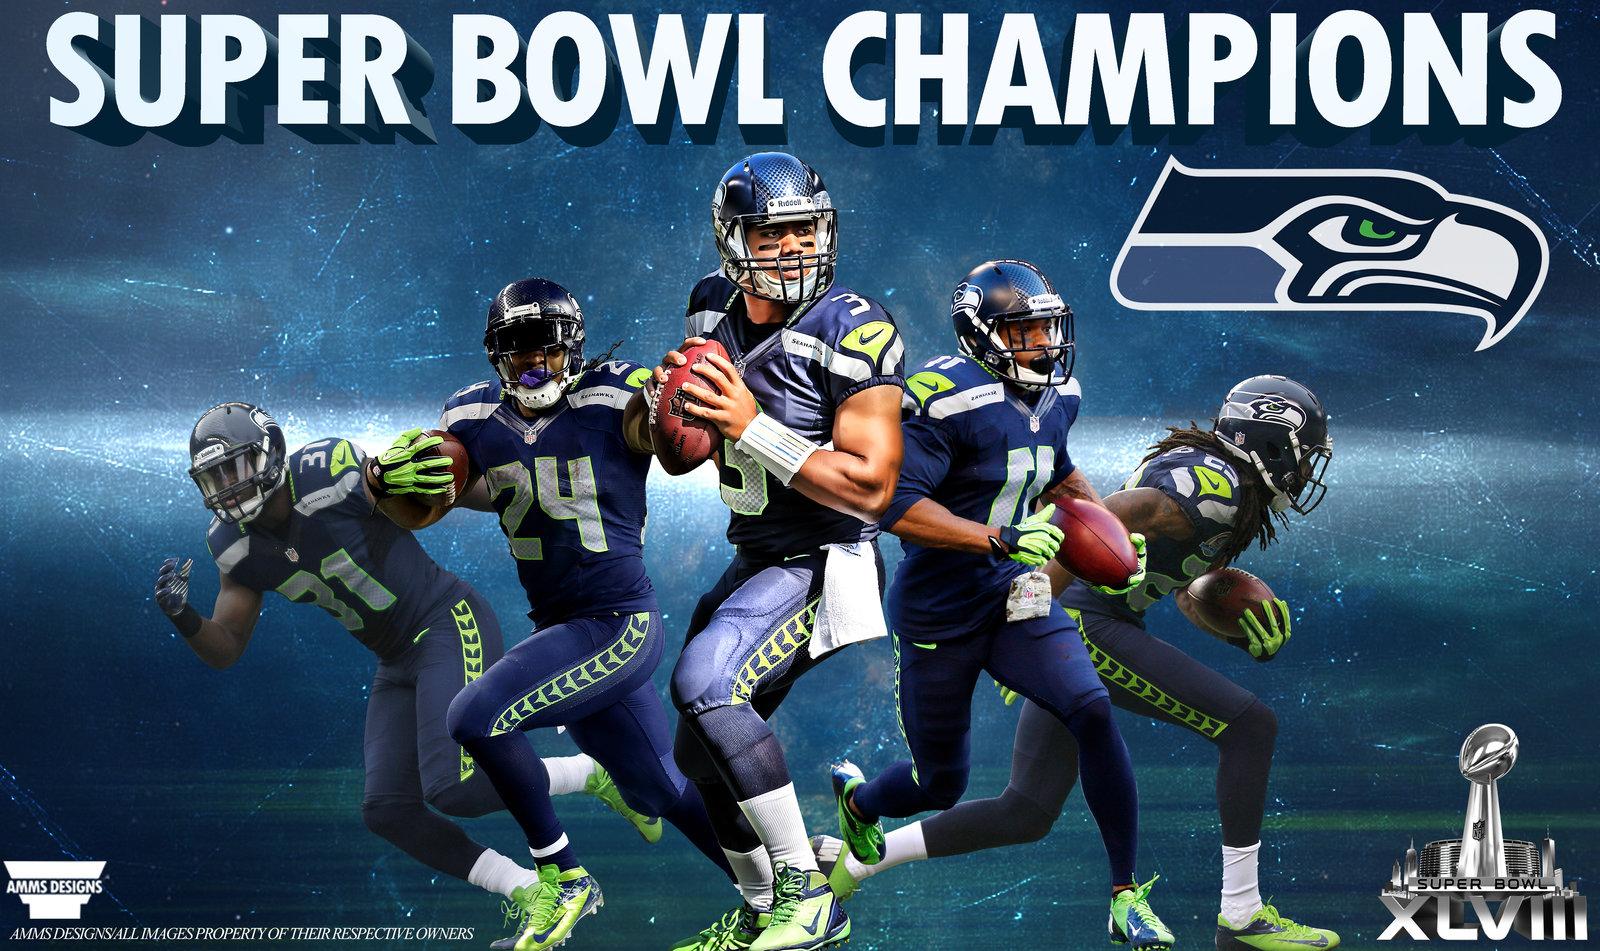 Seahawks Superbowl Champions Image Auto Design Tech 1600x951